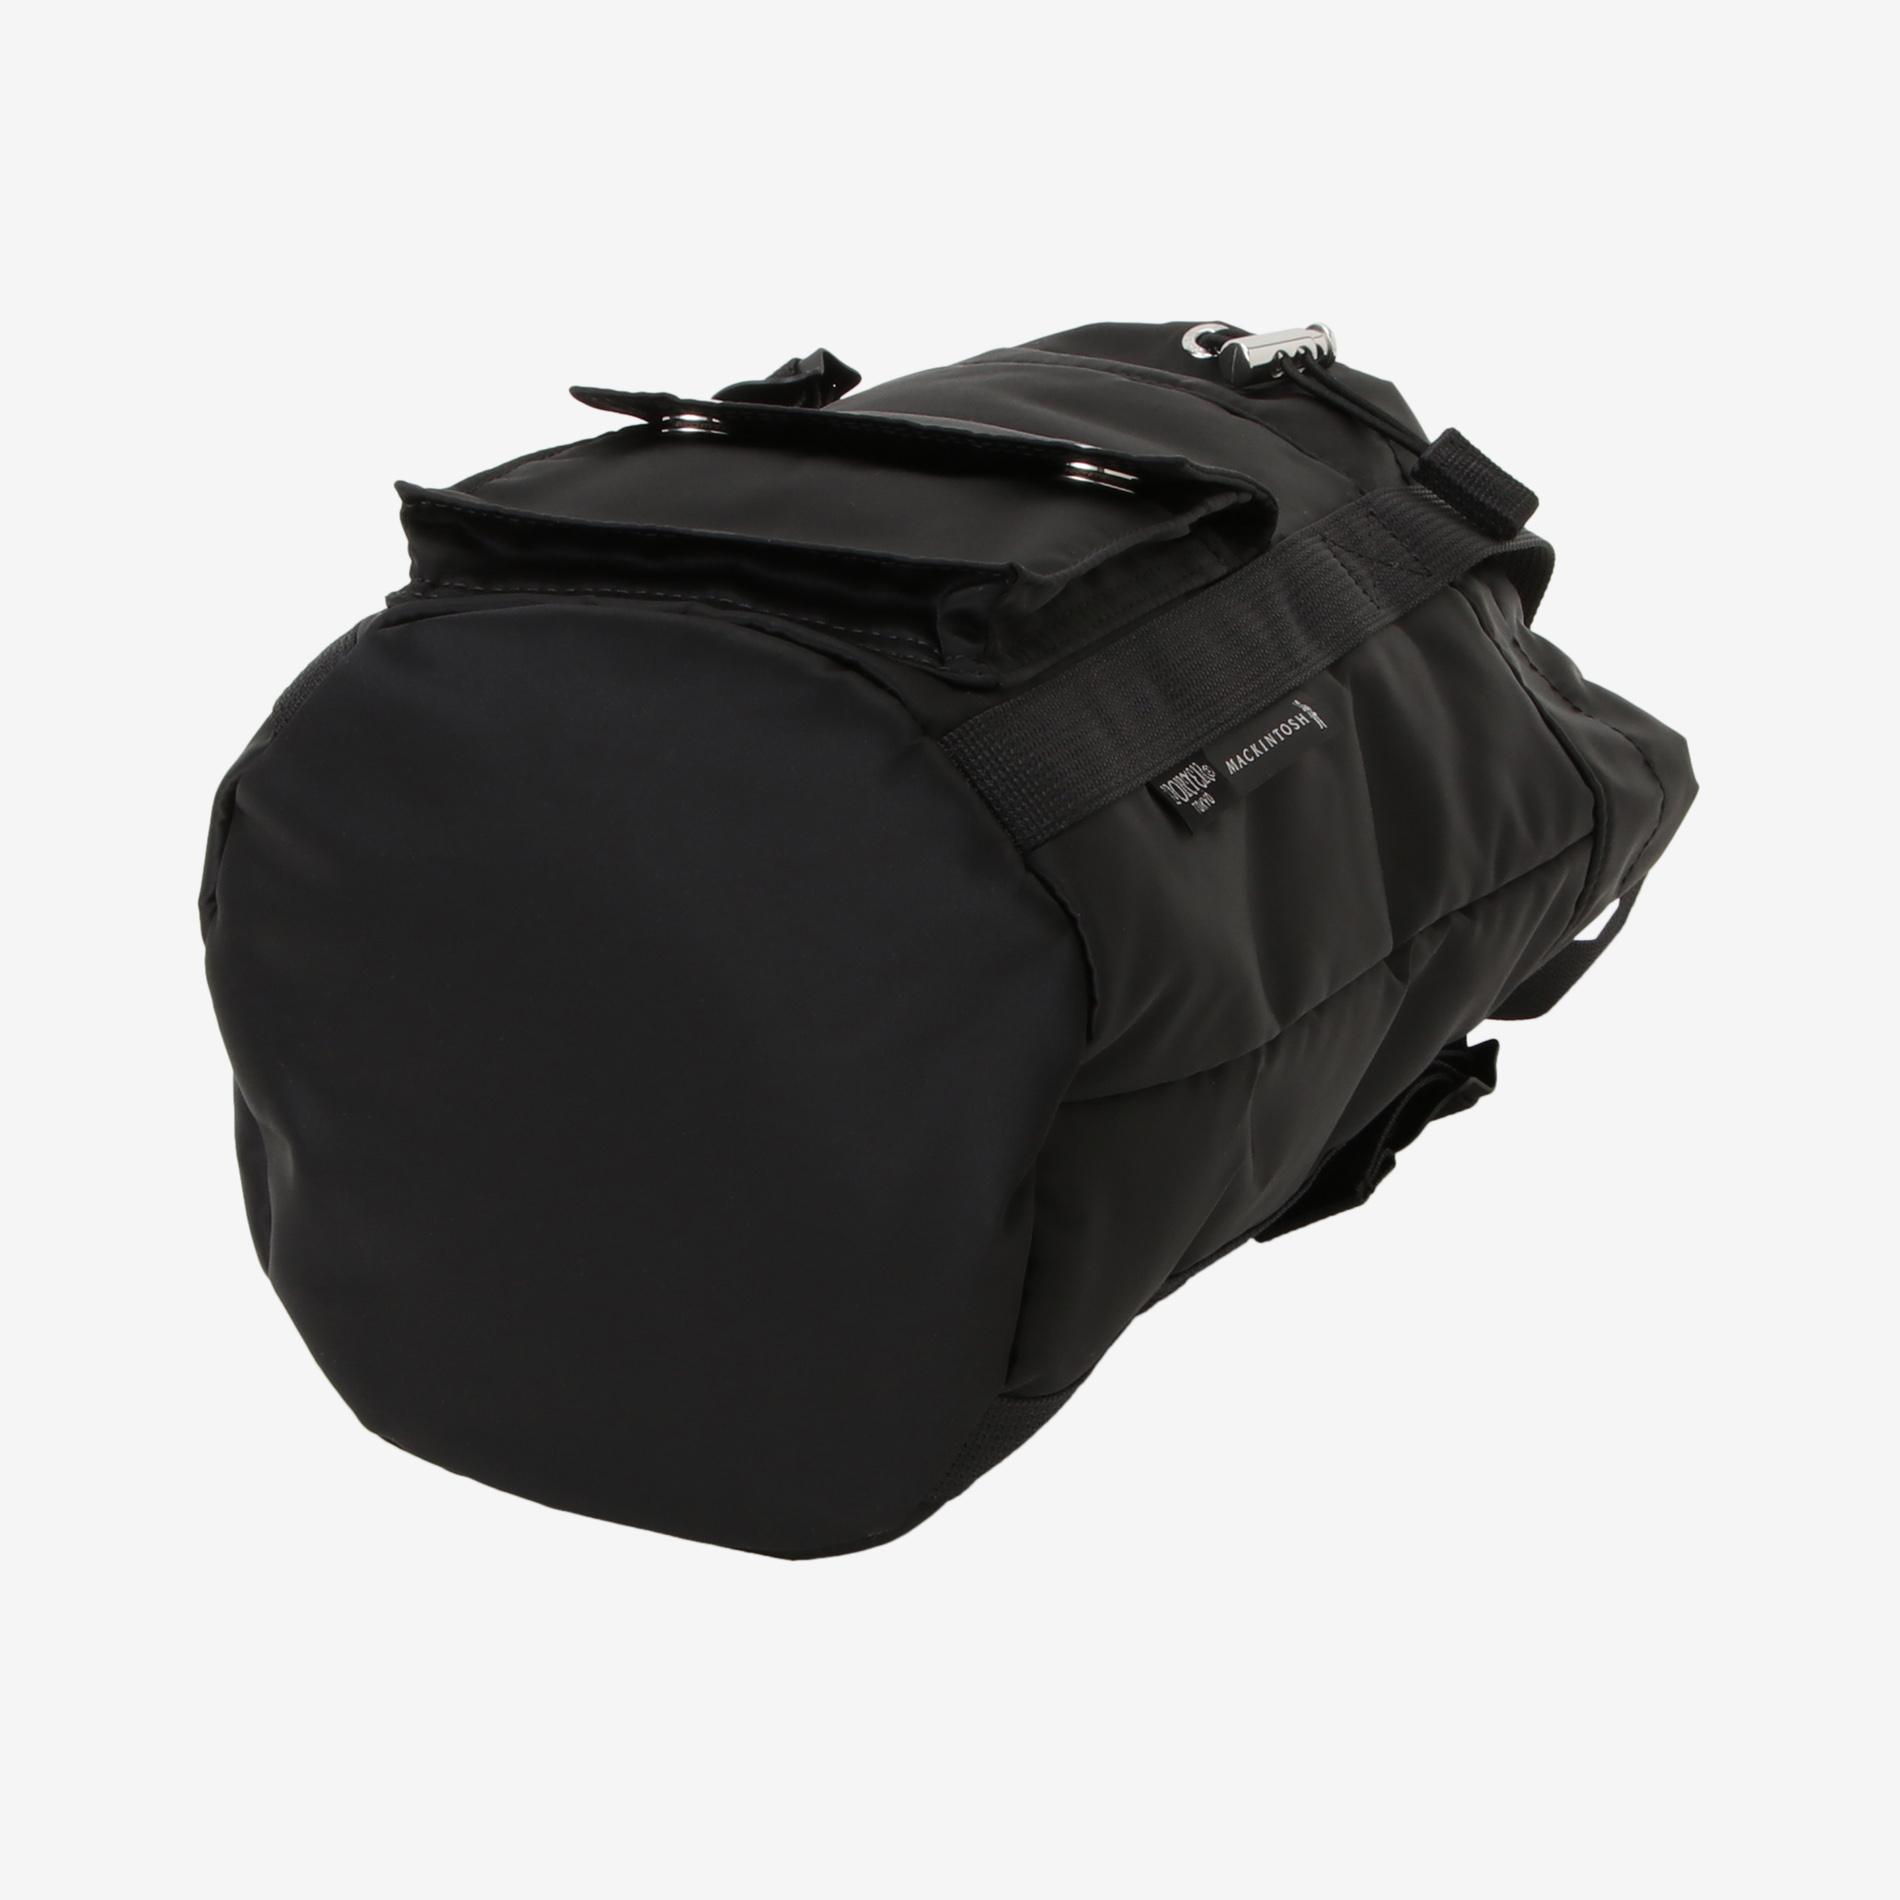 ◆◆【MACKINTOSH×PORTER】ミニバケツトートバッグ